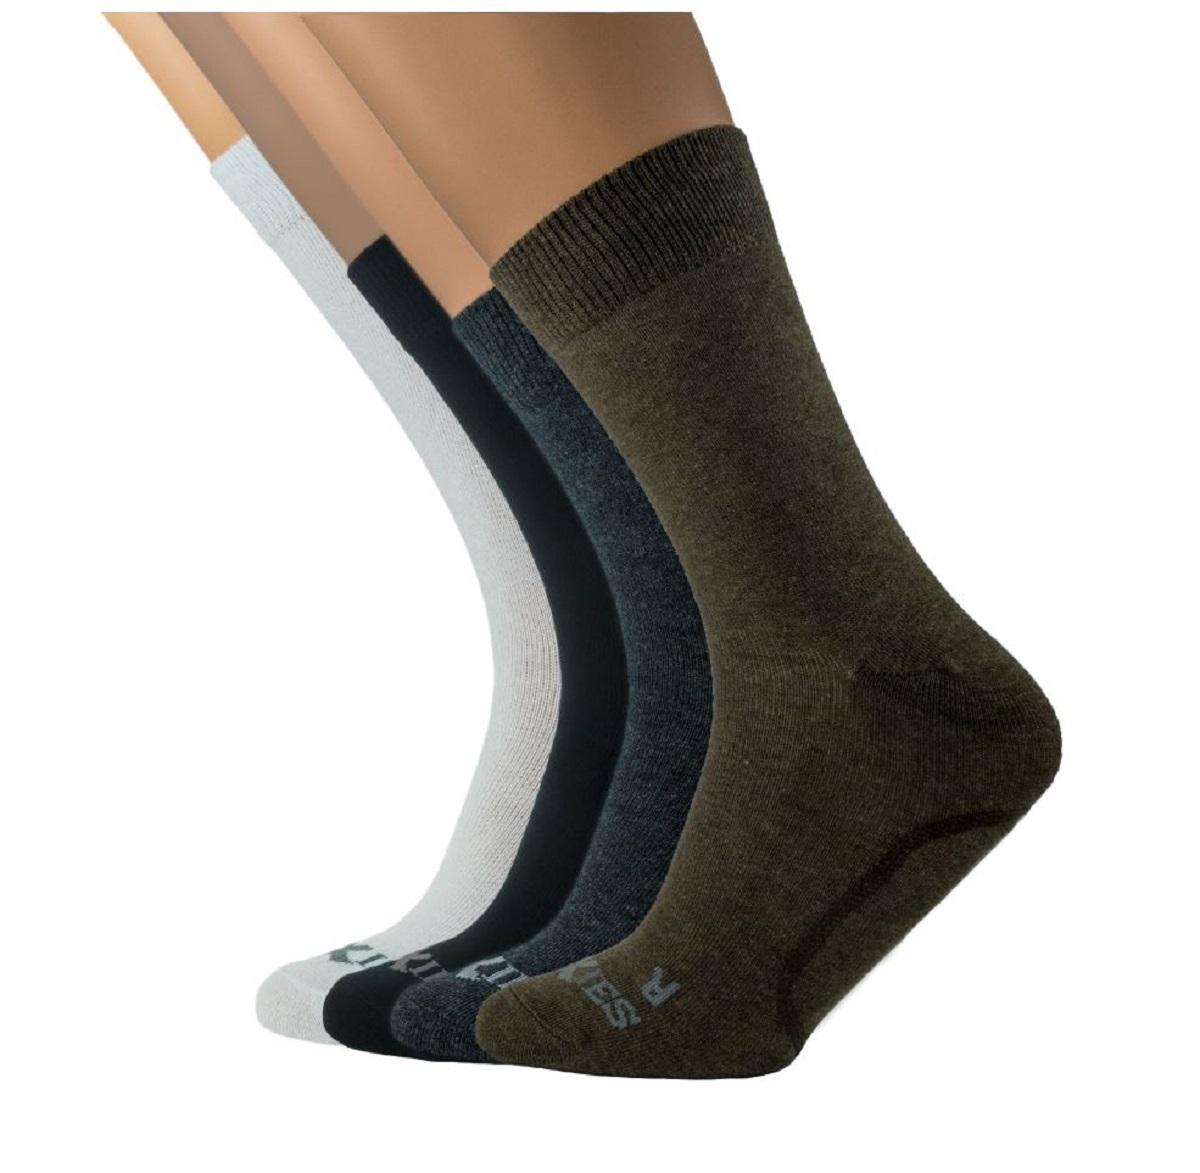 SOXIES Gel Pad Socken Einlage Laufsocke Wandern Wellness Massage in Schwarz NEU